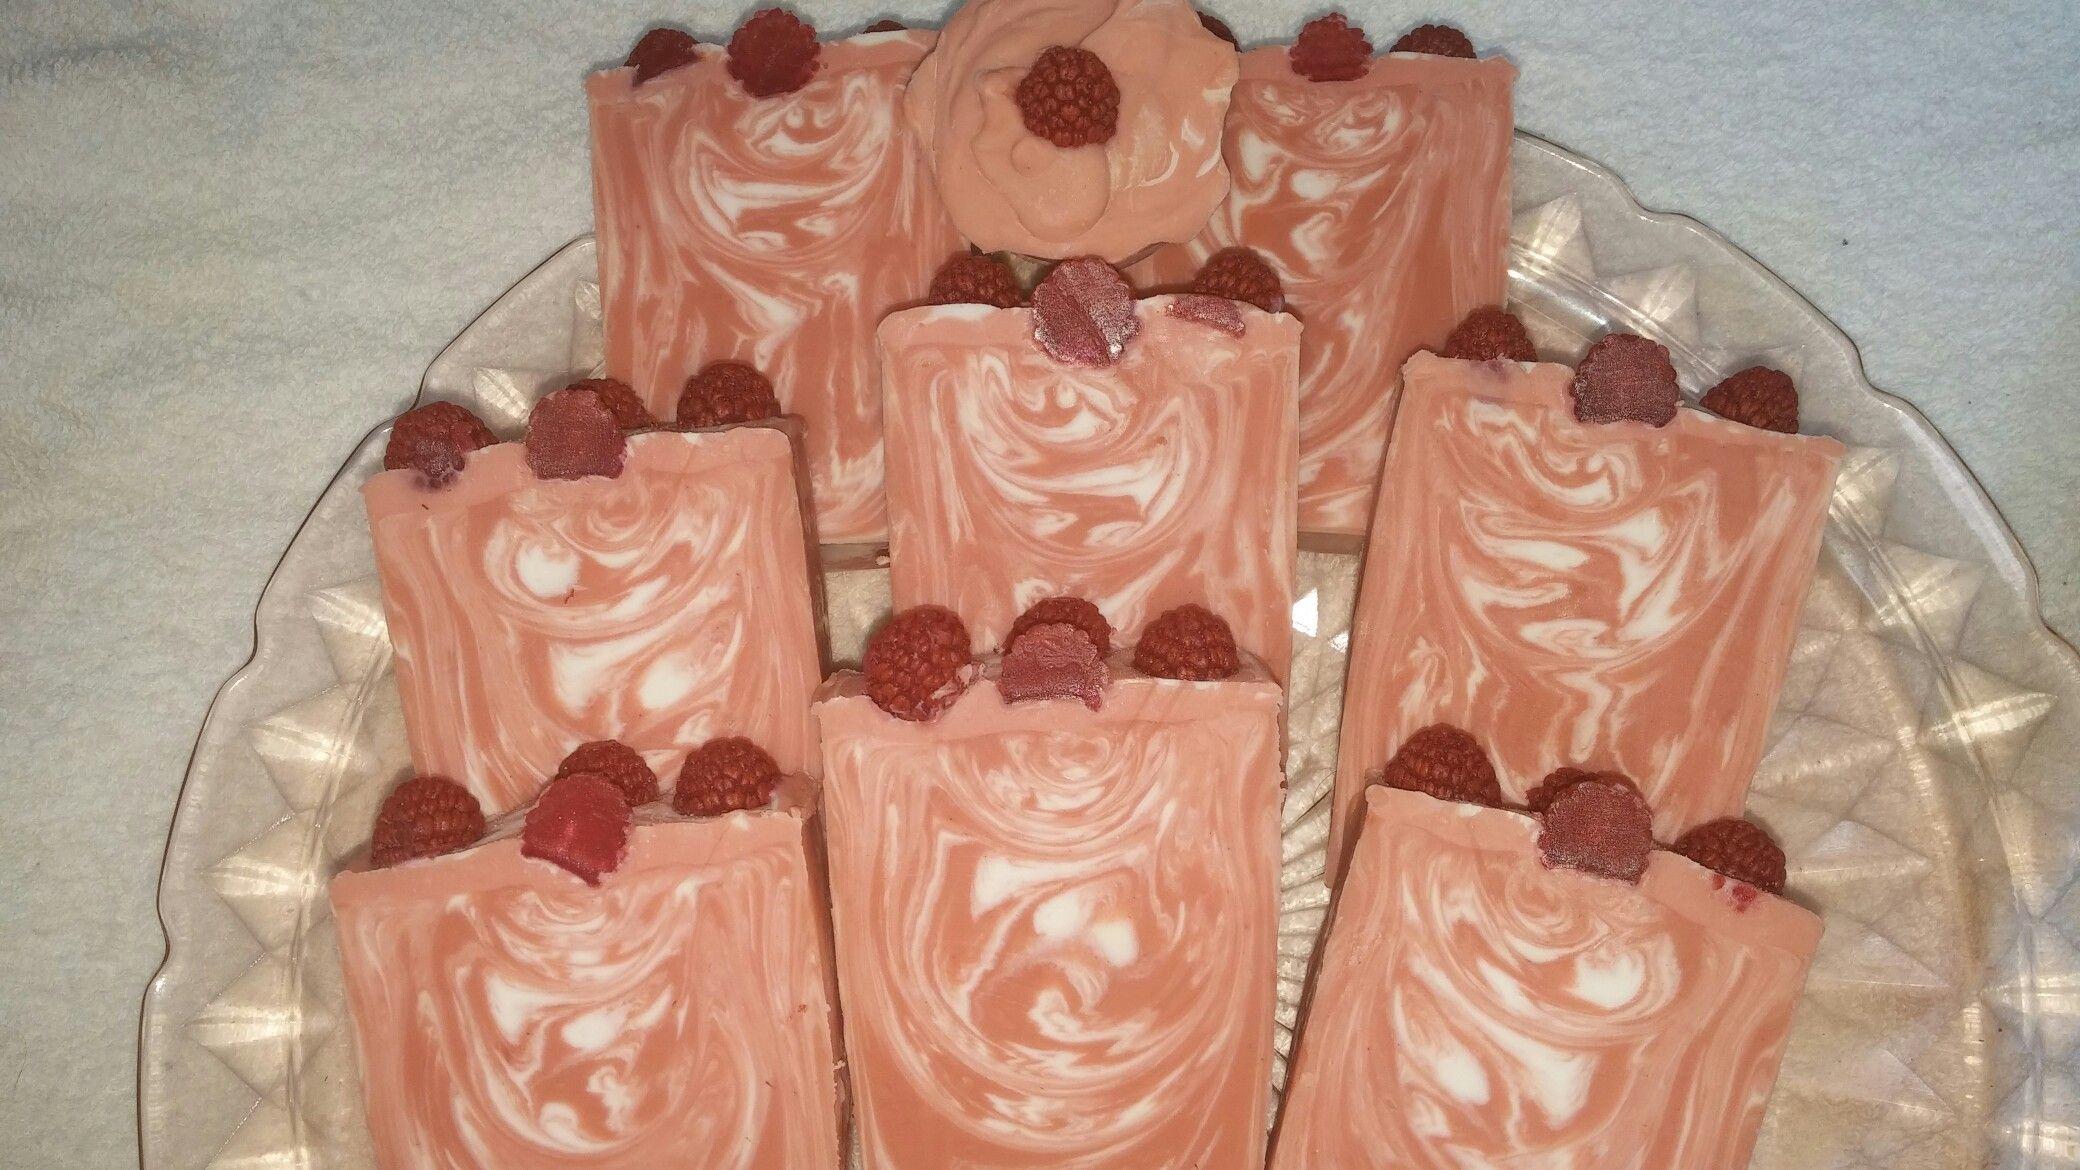 Black Raspberry Vanilla cp soap. Smooth, creamy, and sweet. Love it!